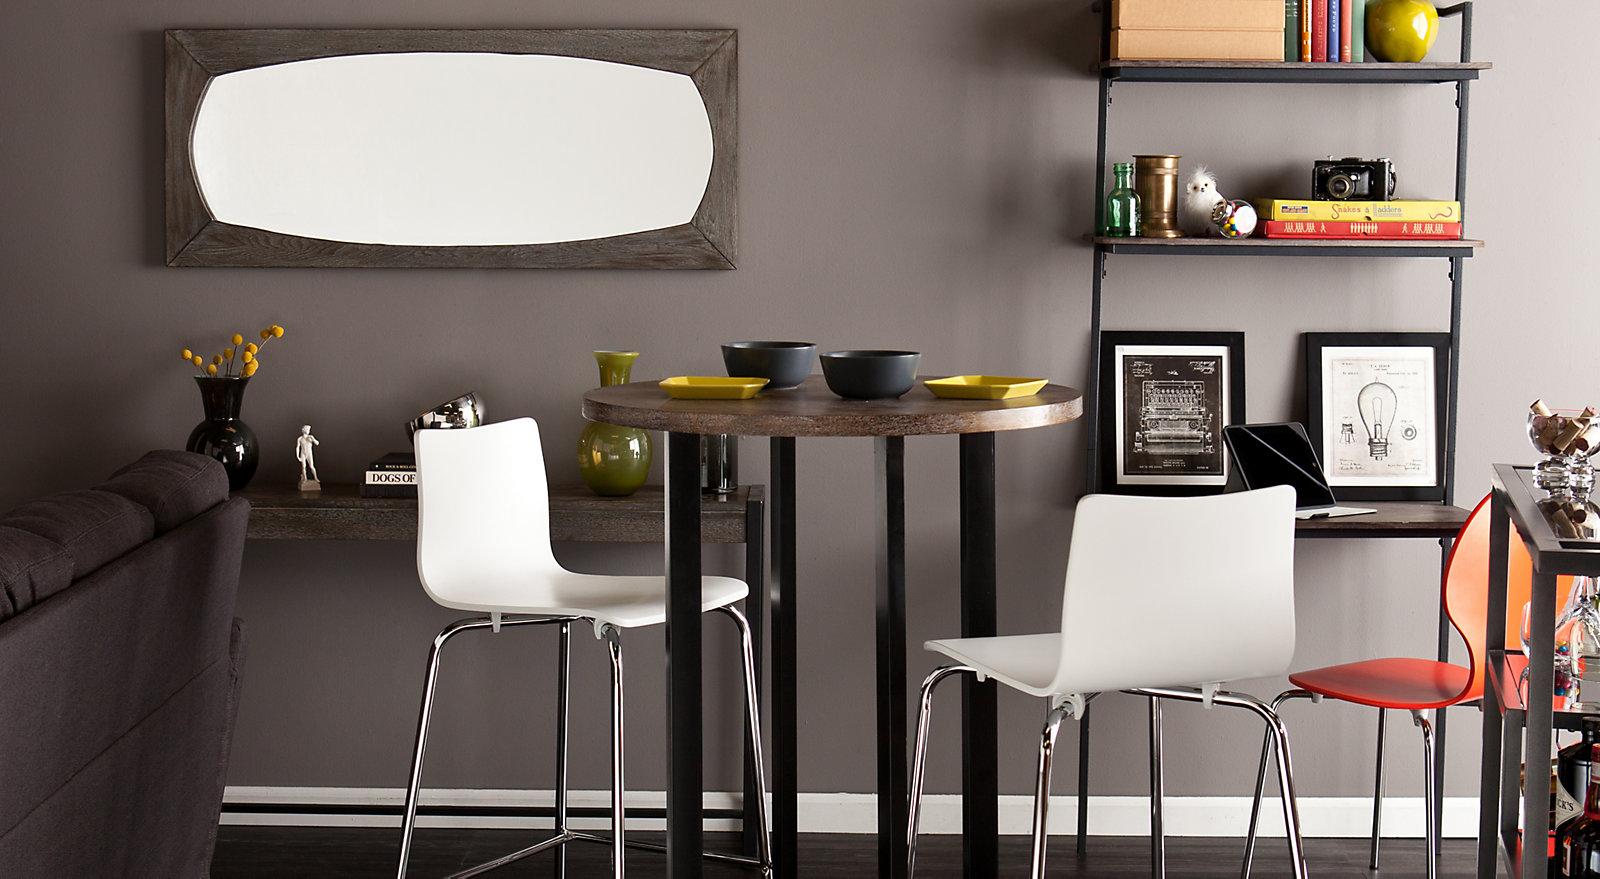 Small furniture (Photo credit: Smart Furniture) SKMIEGD